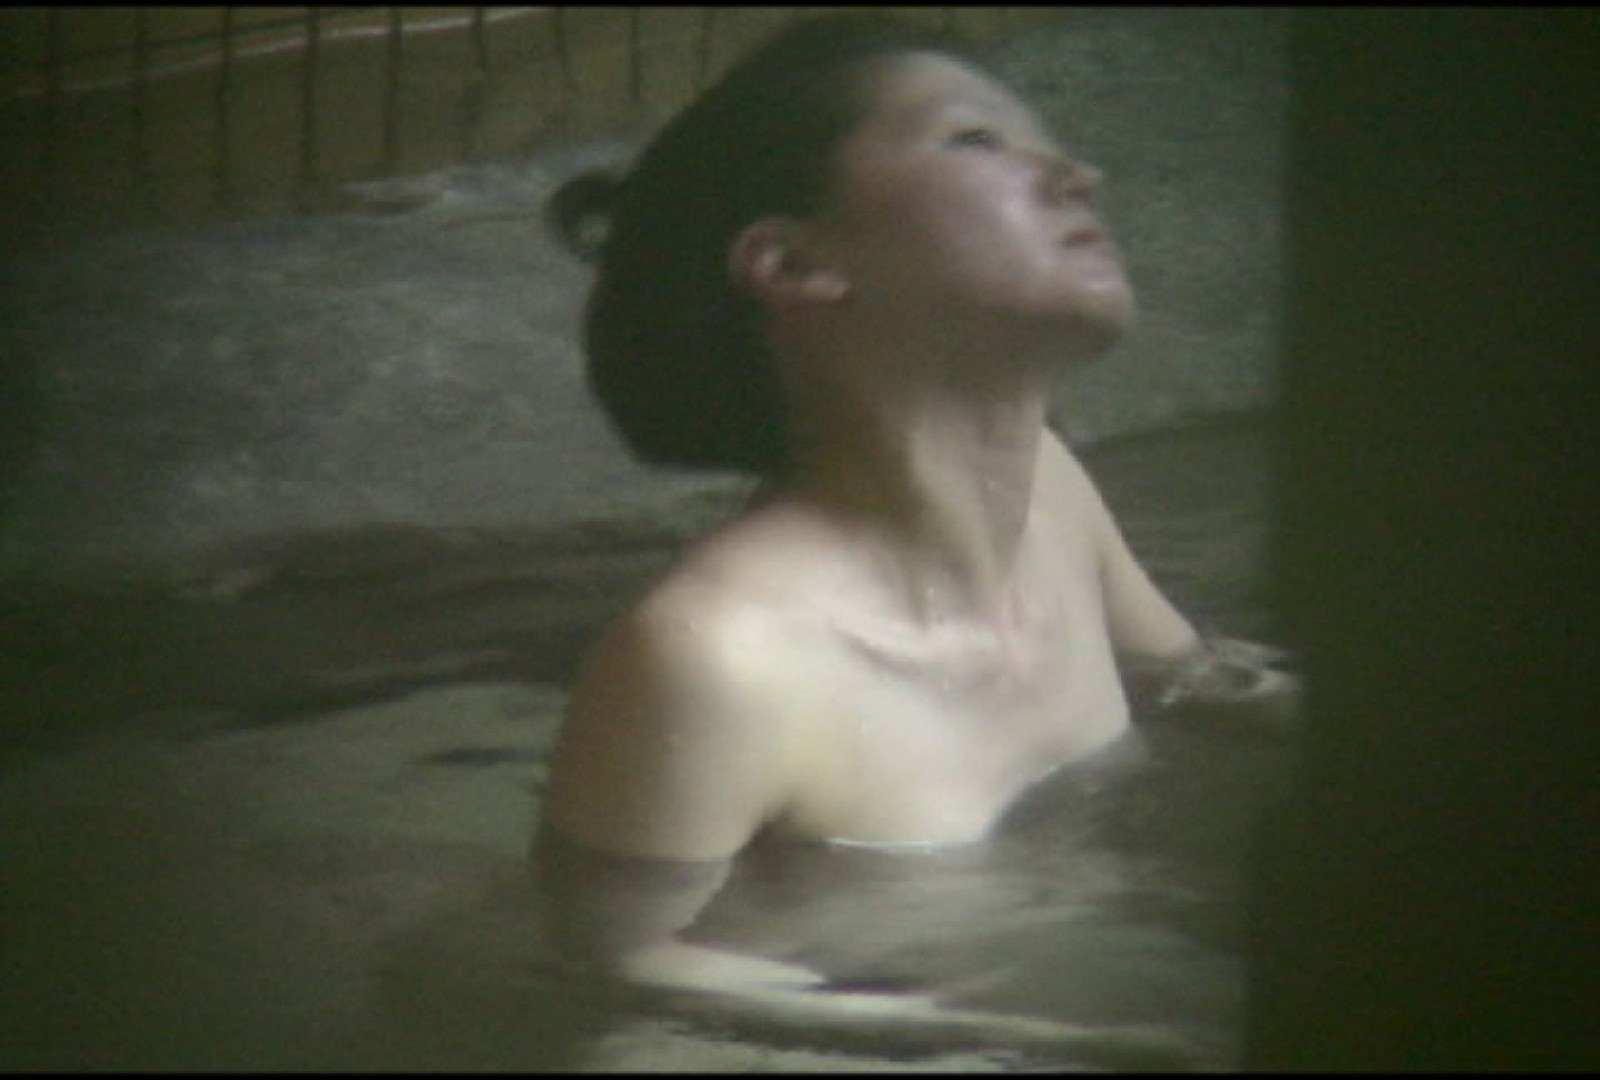 Aquaな露天風呂Vol.699 露天風呂 | OLのエロ生活  104連発 52